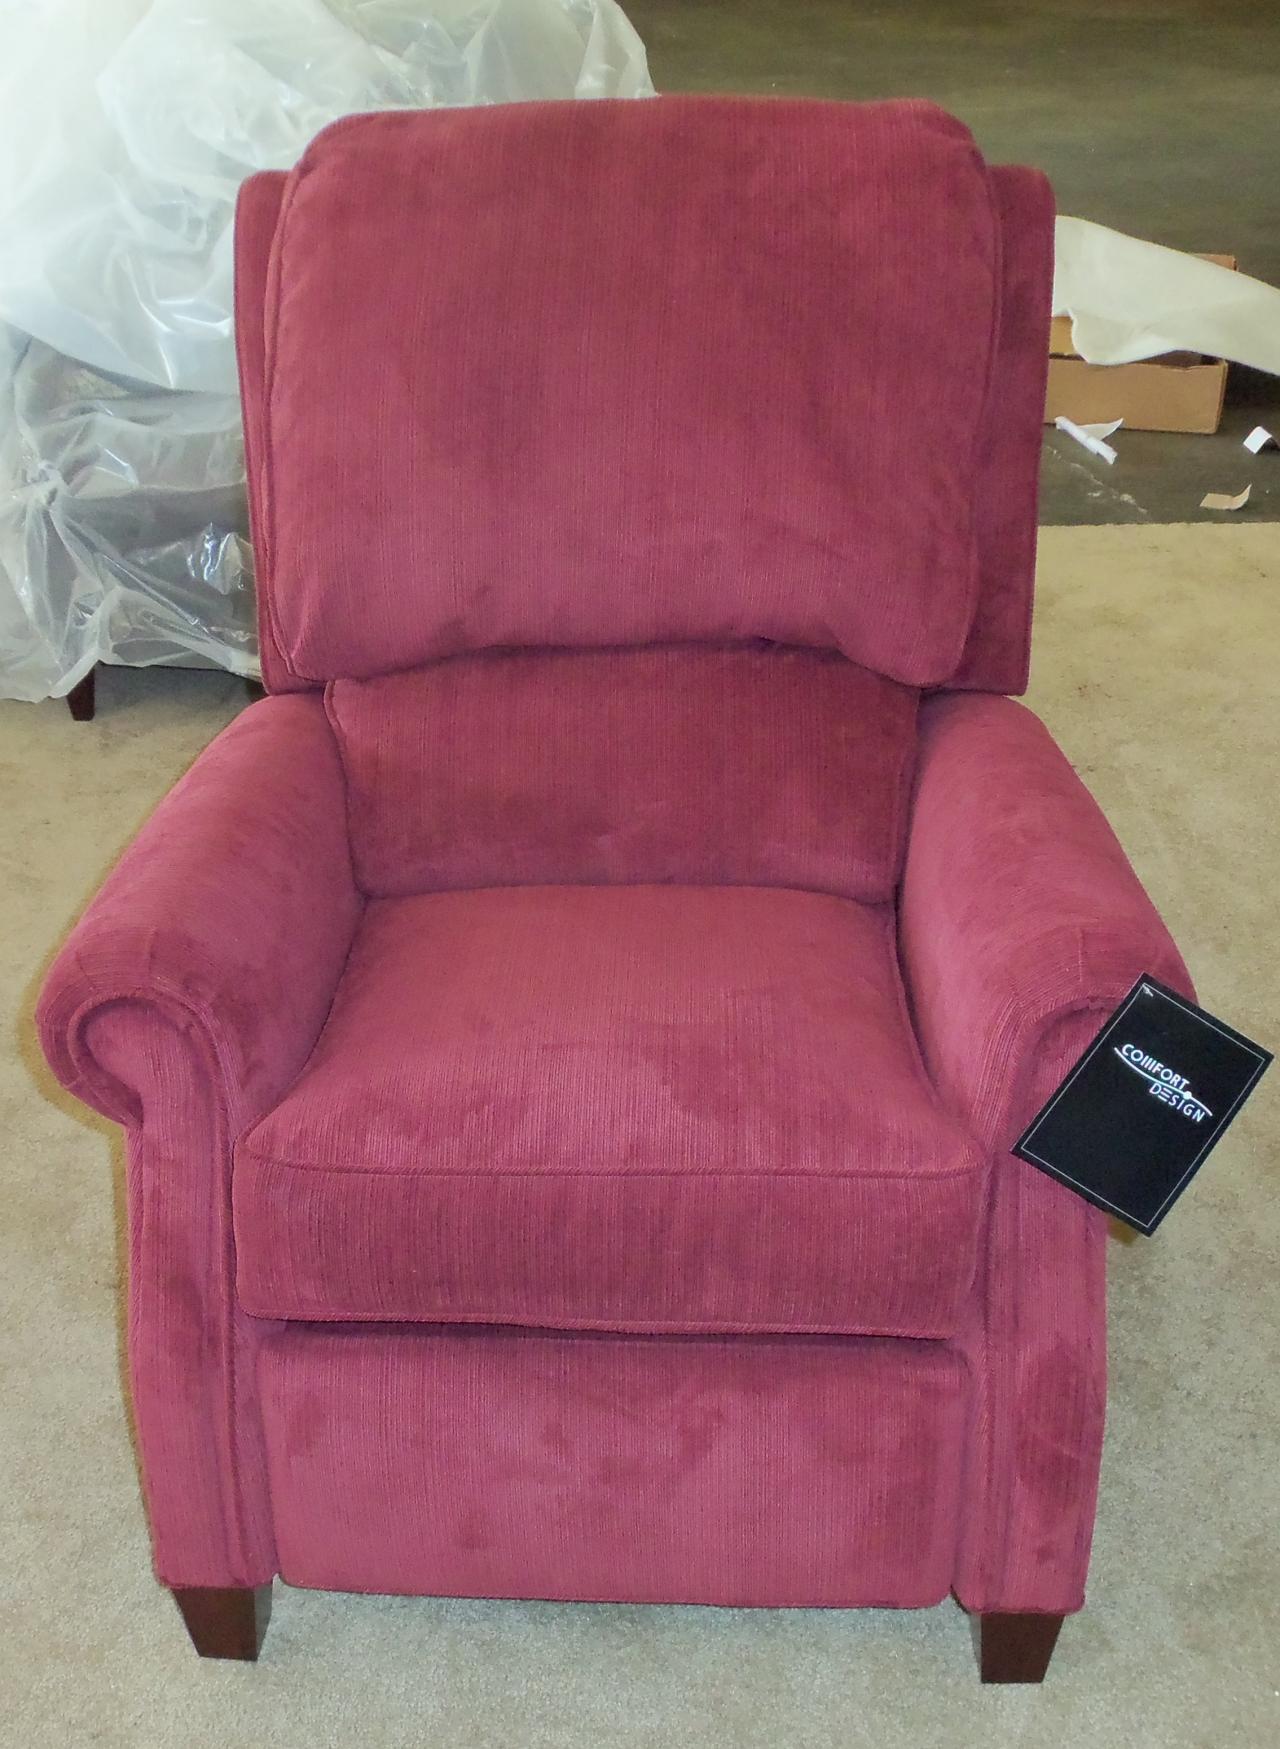 Barnett Furniture Comfort Design Martin Recliner